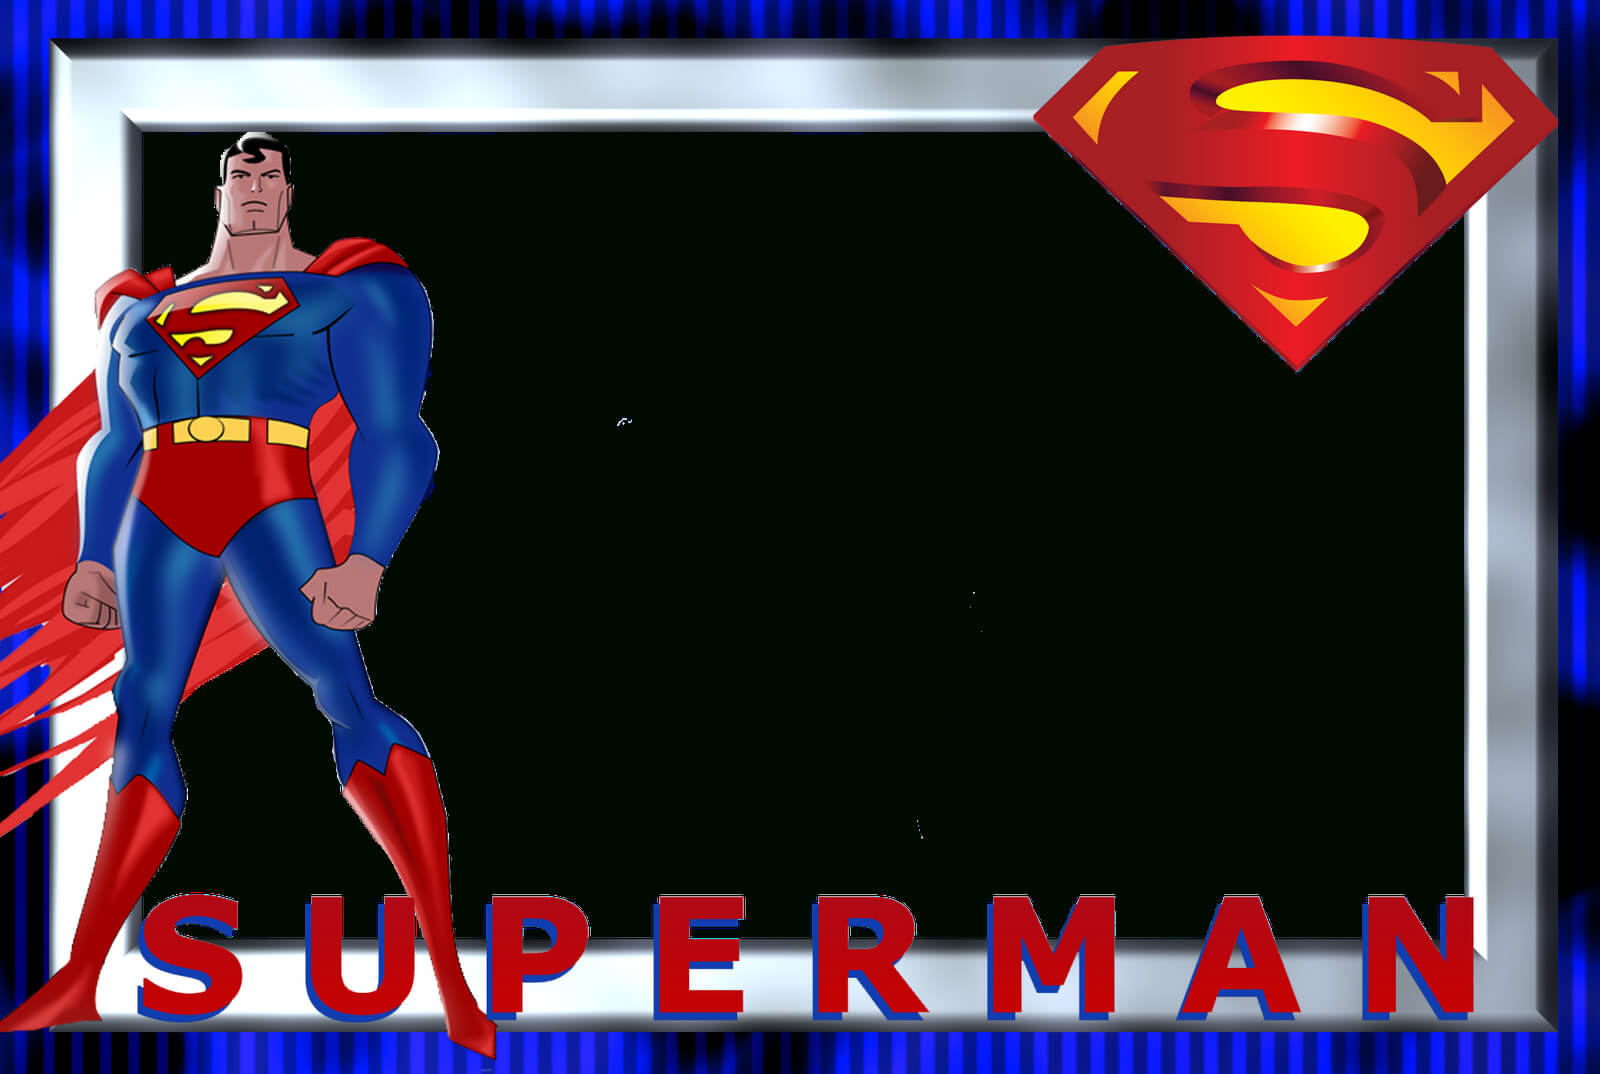 Superman Birthday Card Template ] - Superhero Party Throughout Superman Birthday Card Template